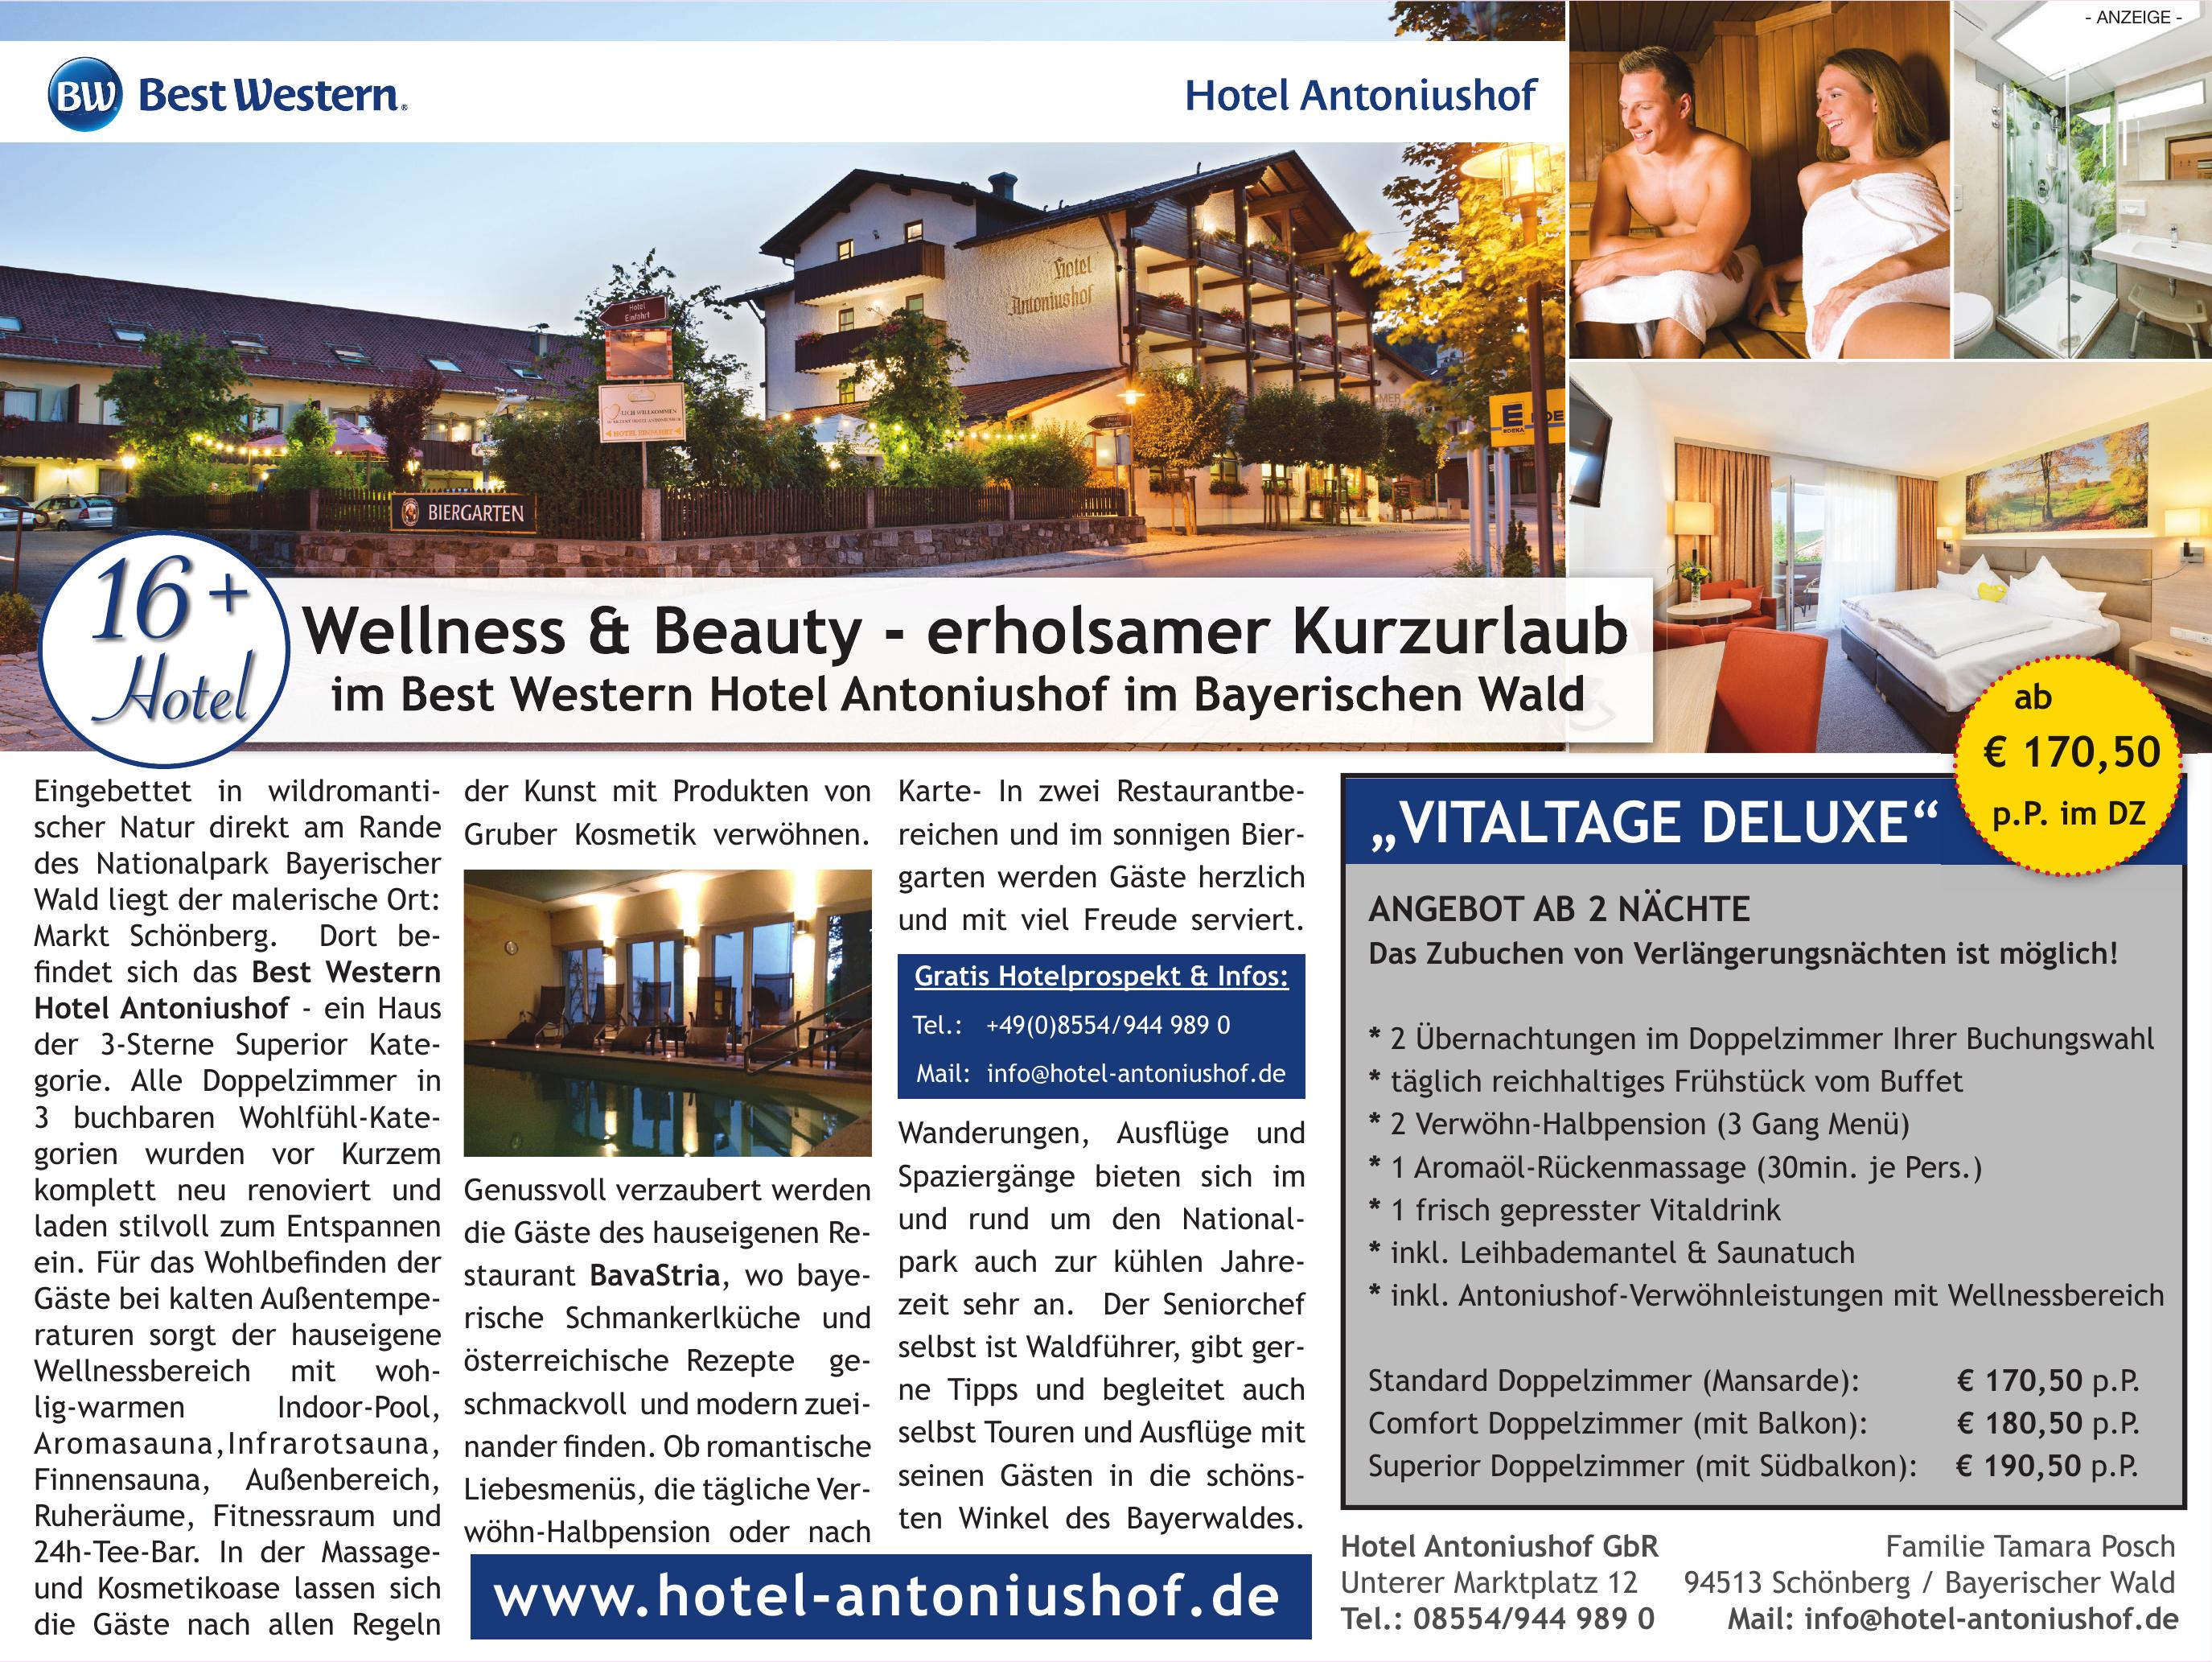 Hotel Antoniushof GbR